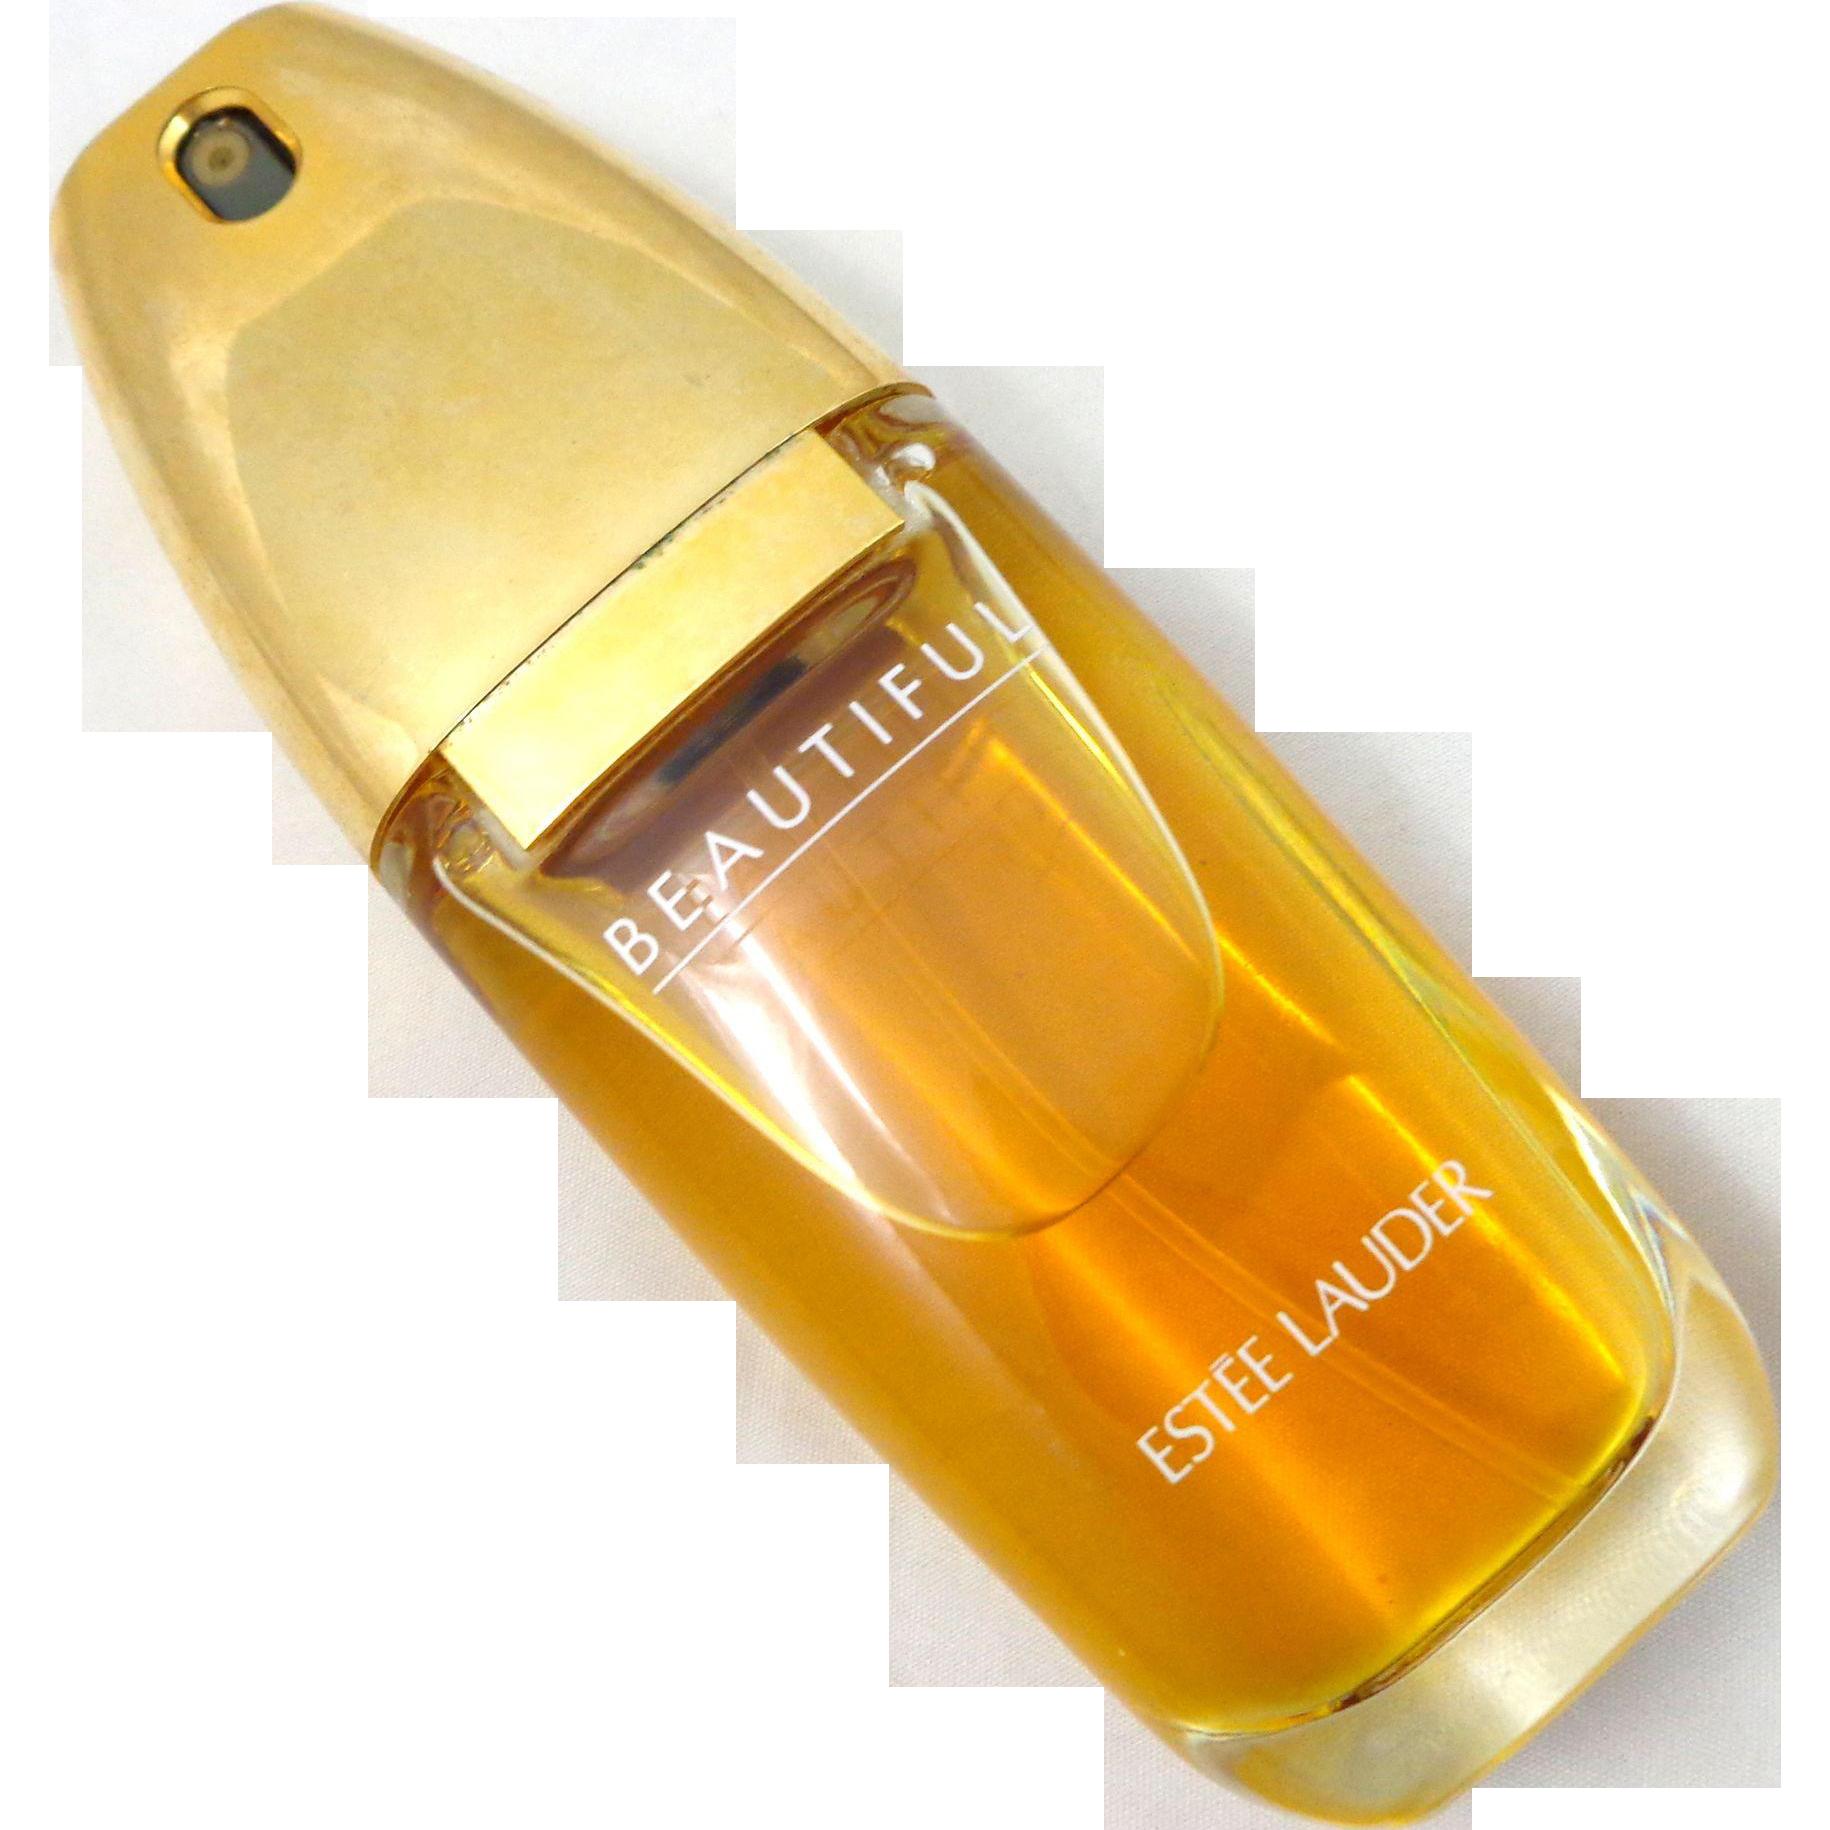 Estee Lauder BEAUTIFUL Perfume EDP 2.5 fl ozs